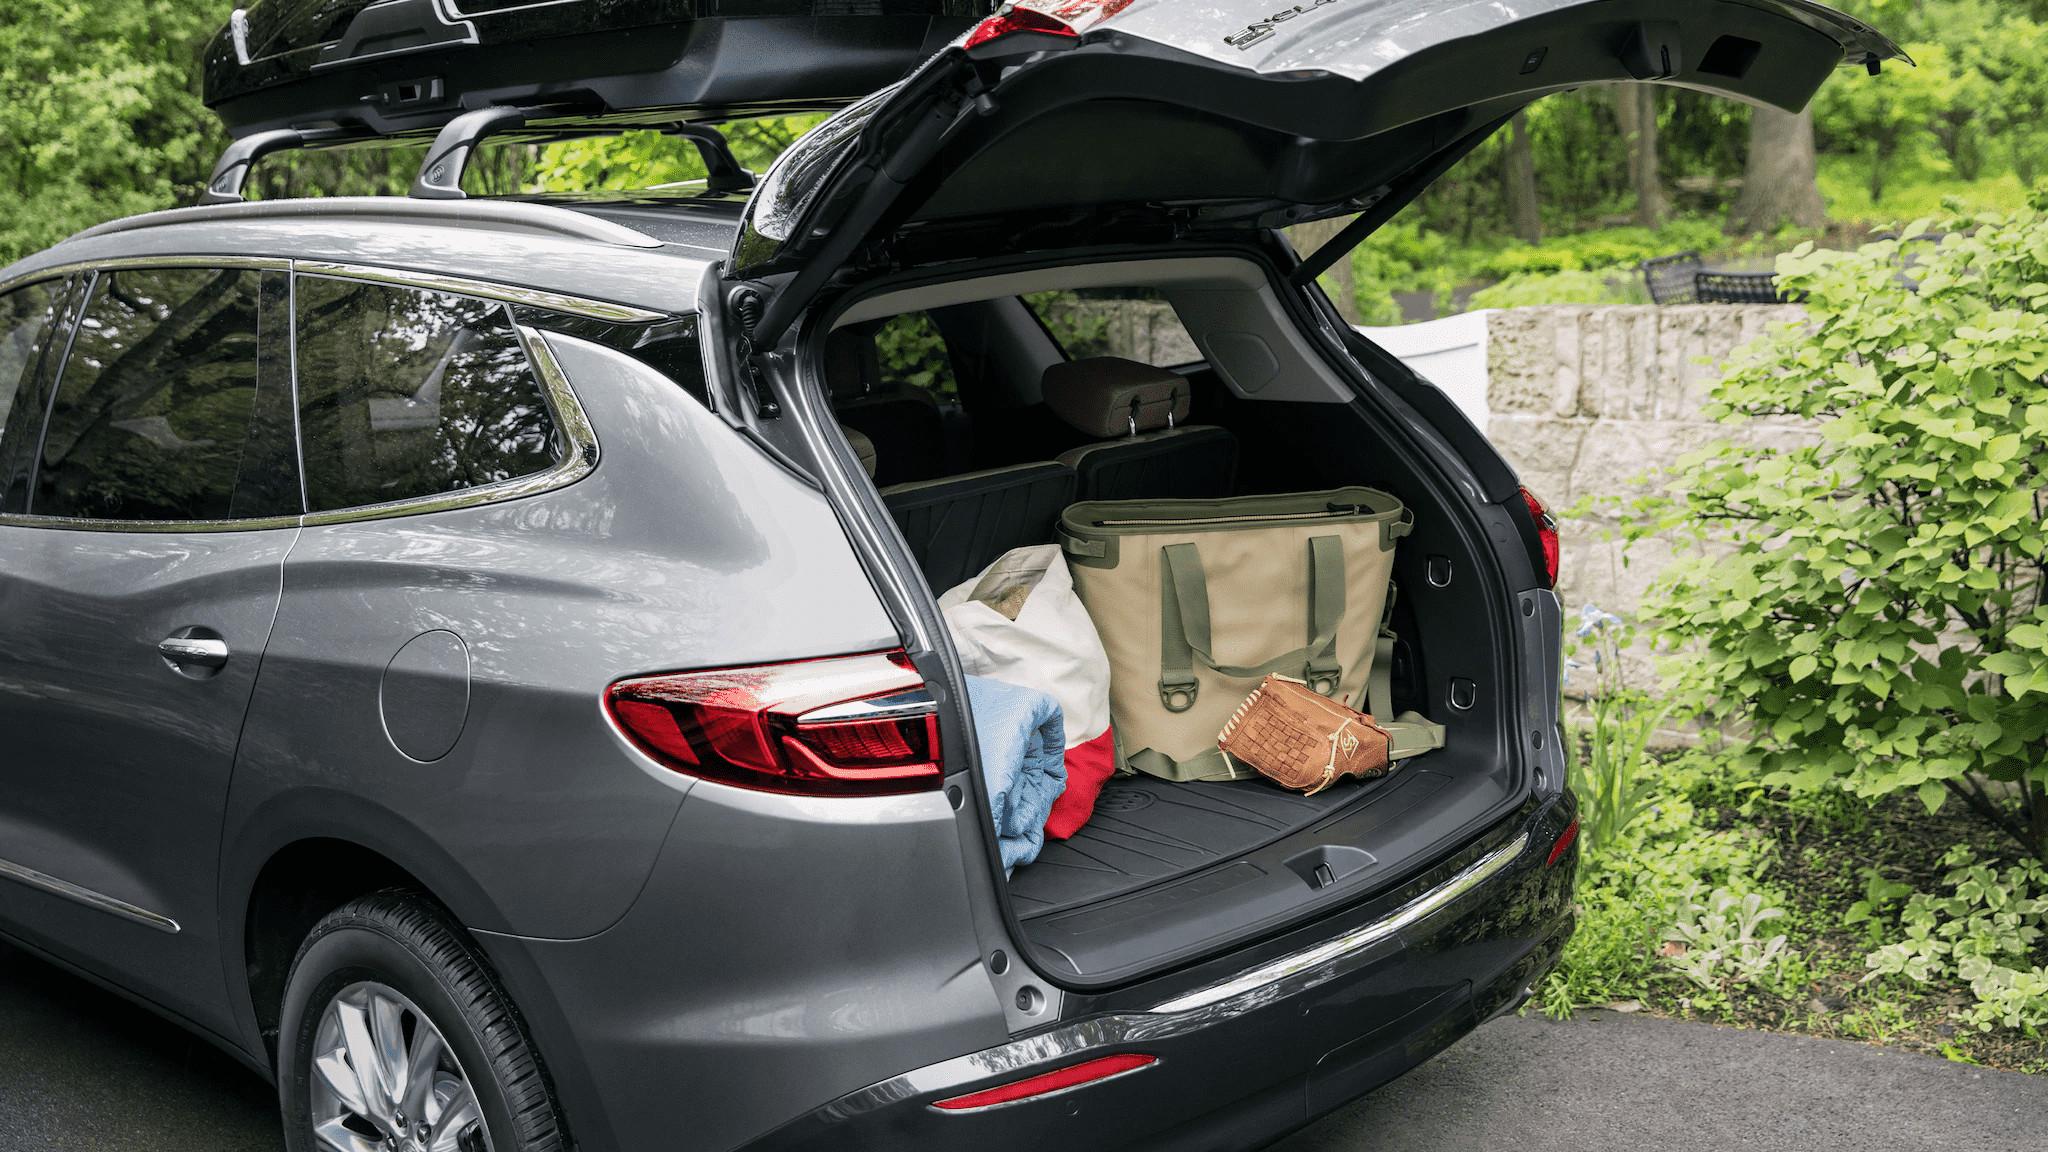 2020 Buick Enclave Power Programmable Liftgate